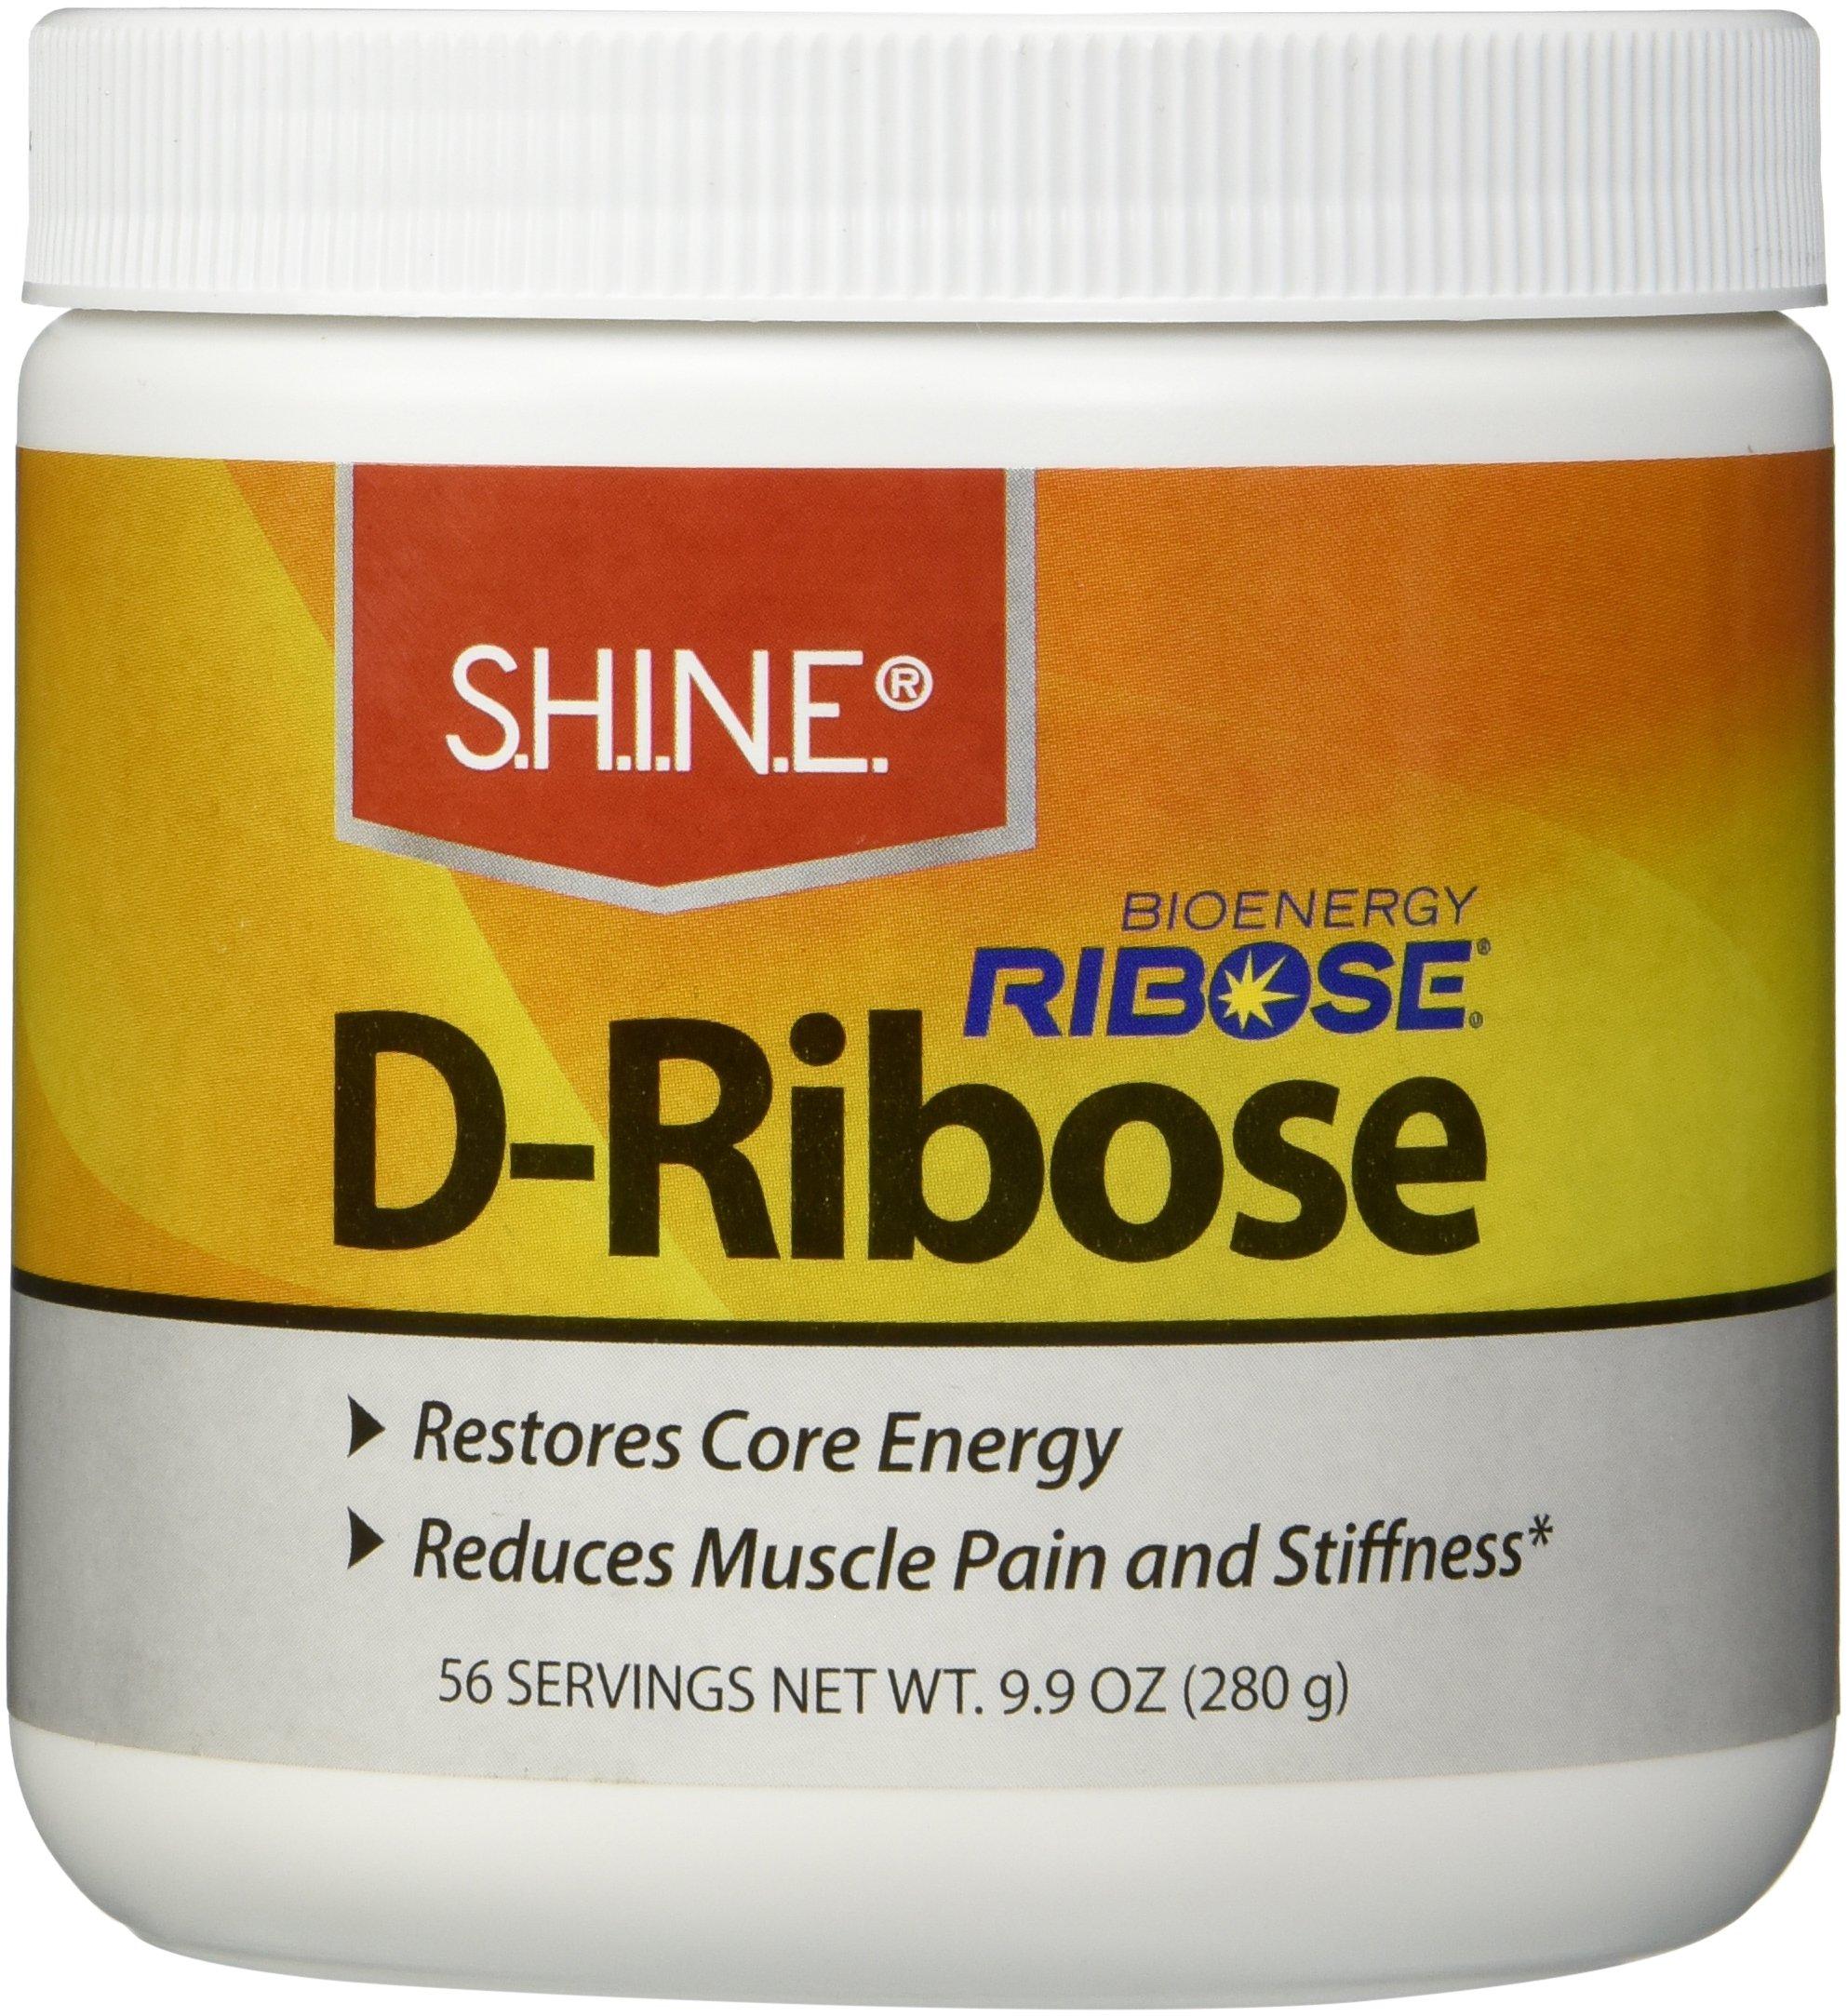 S.H.I.N.E.® D-Ribose With Bioenergy Ribose® 9.9 oz (280 g) by Shine